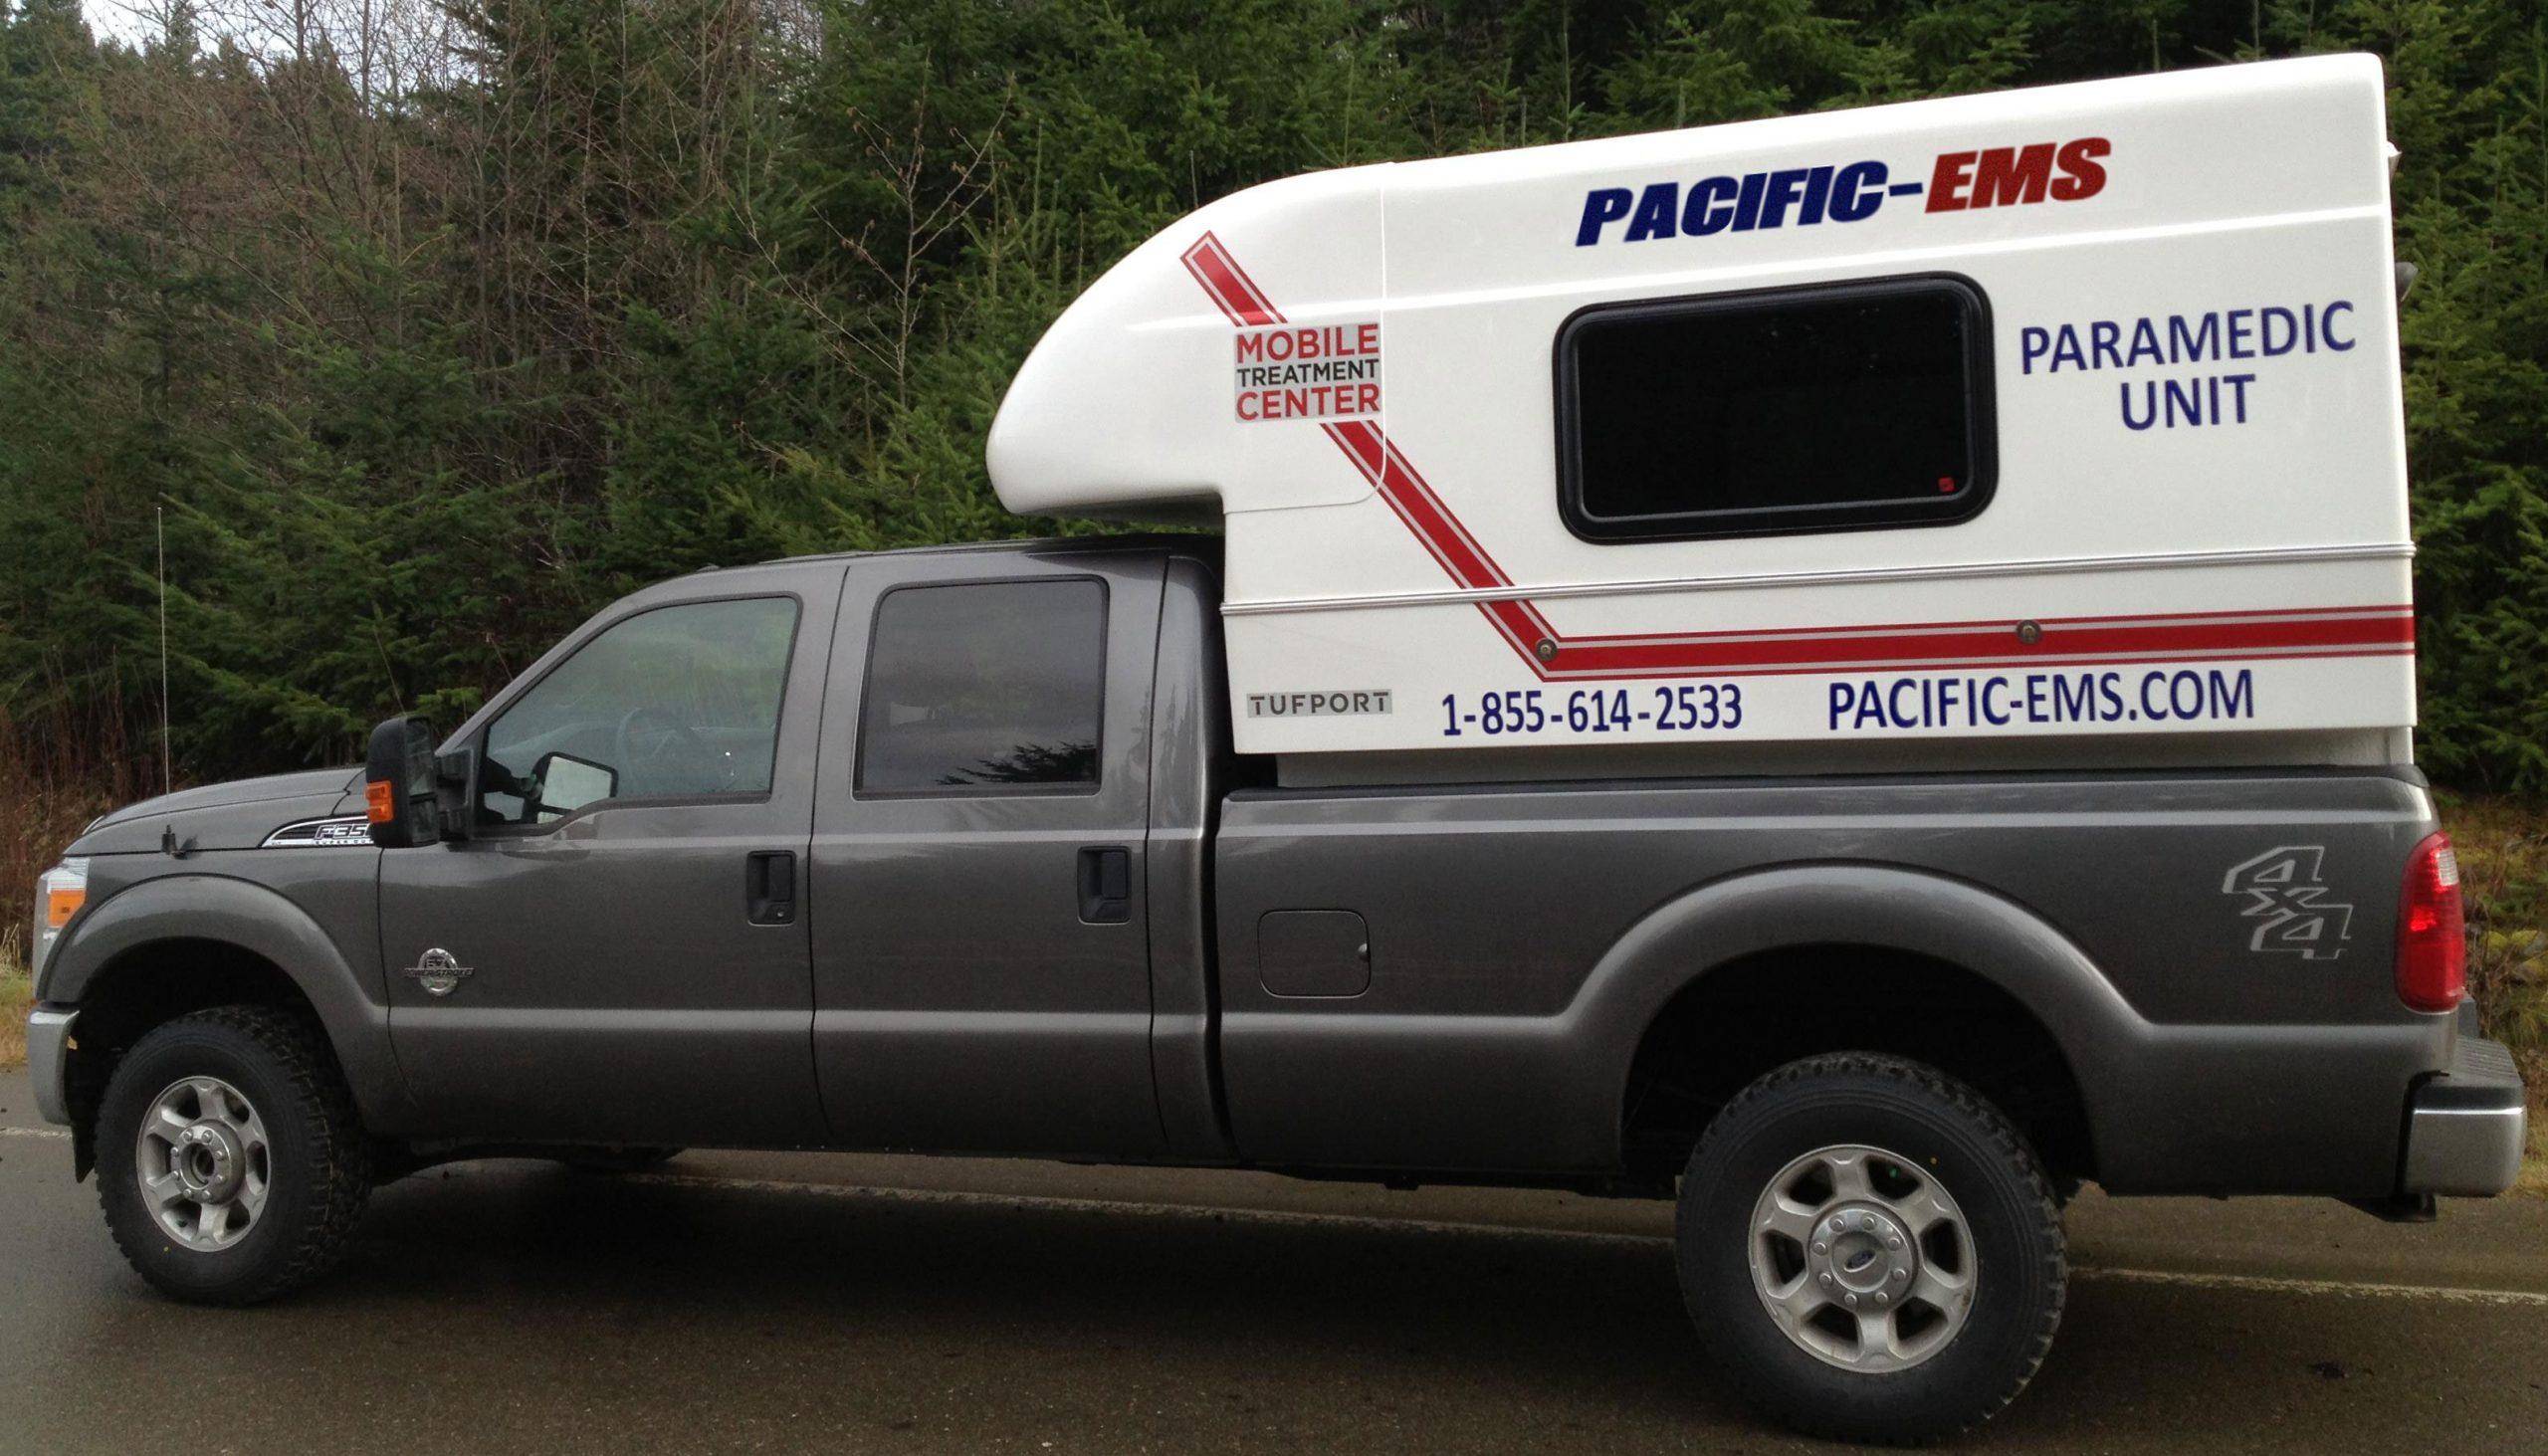 Mobile Treatment Center Pacific EMS ground ambulance patient transfer service